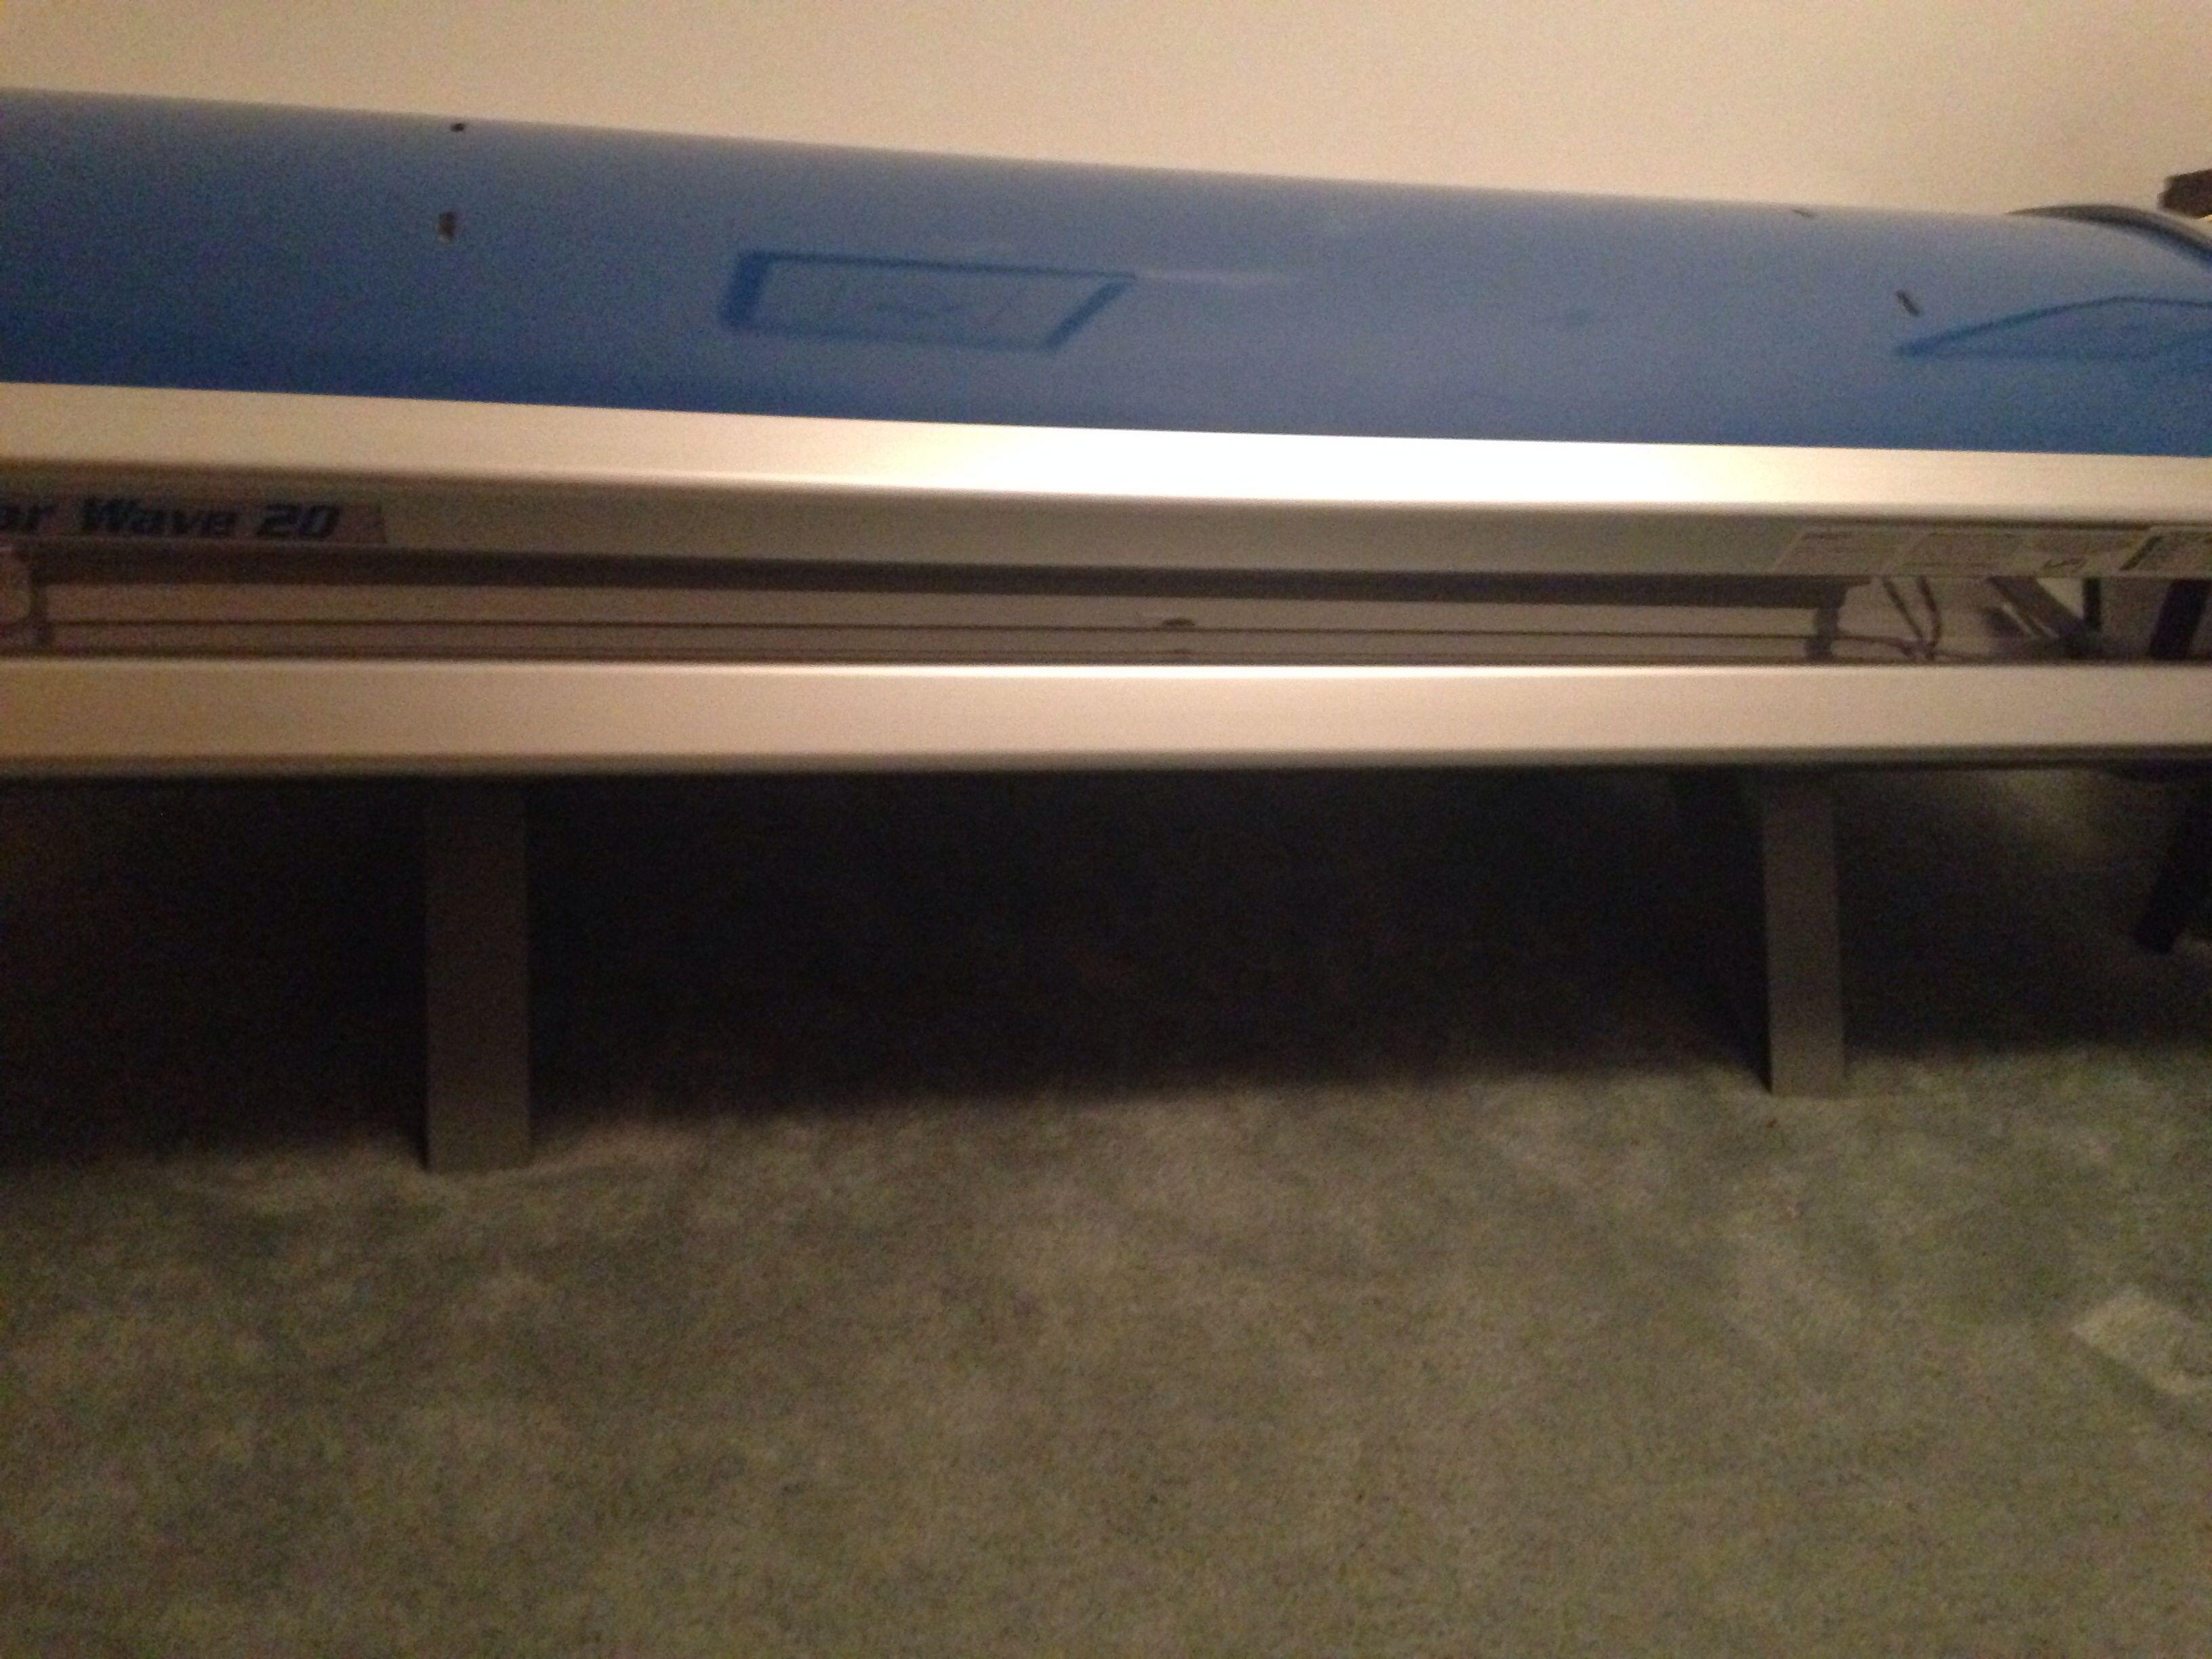 Solar wave Tanning bed in Dealssss' Garage Sale St Clair